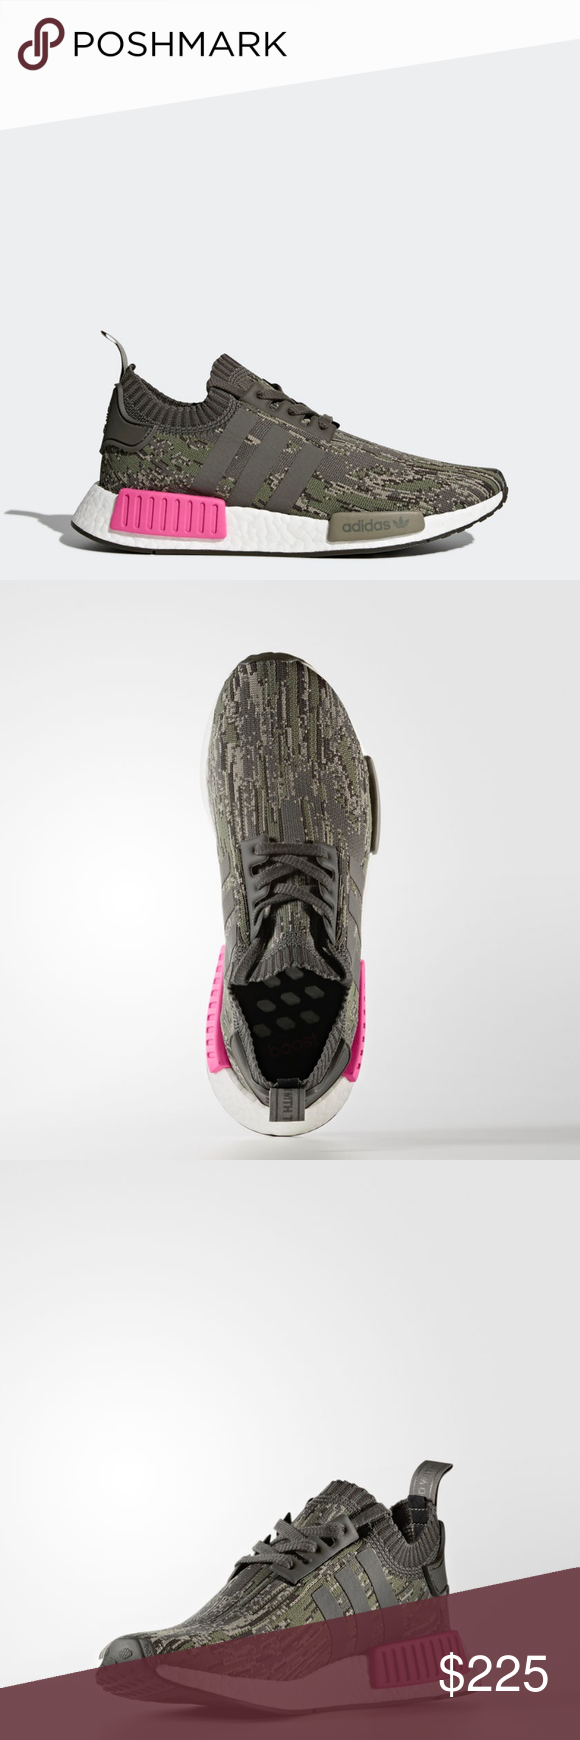 ef7510875 Adidas NMD R1 Utility Gray Camo ~ Pink adidas NMD R1 PK